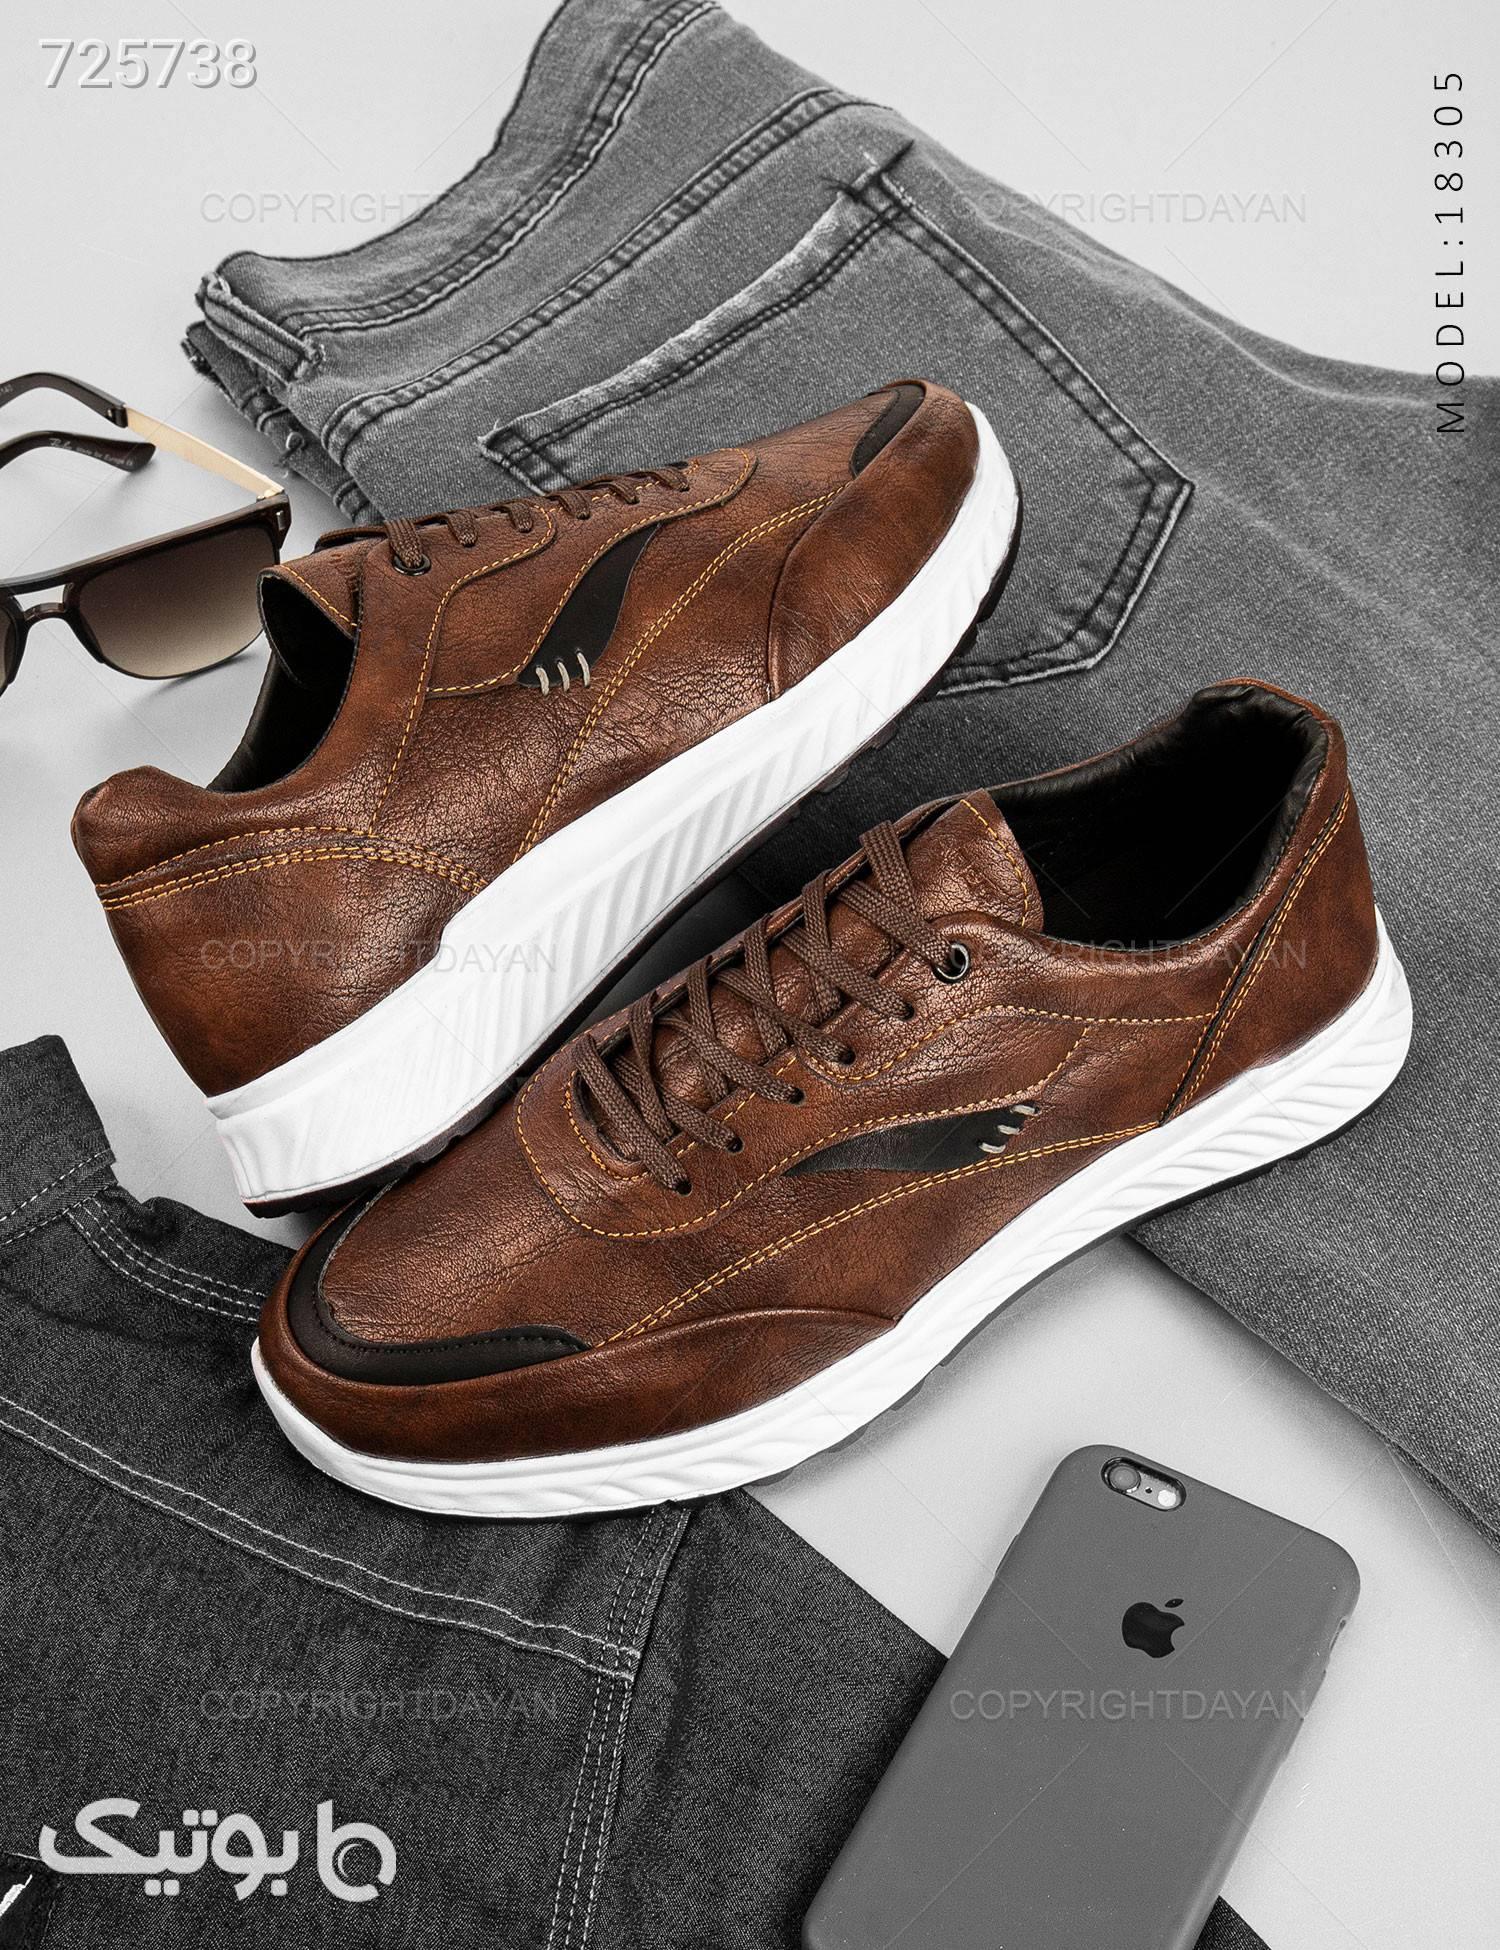 کفش چرم مردانه  قهوه ای كفش مردانه